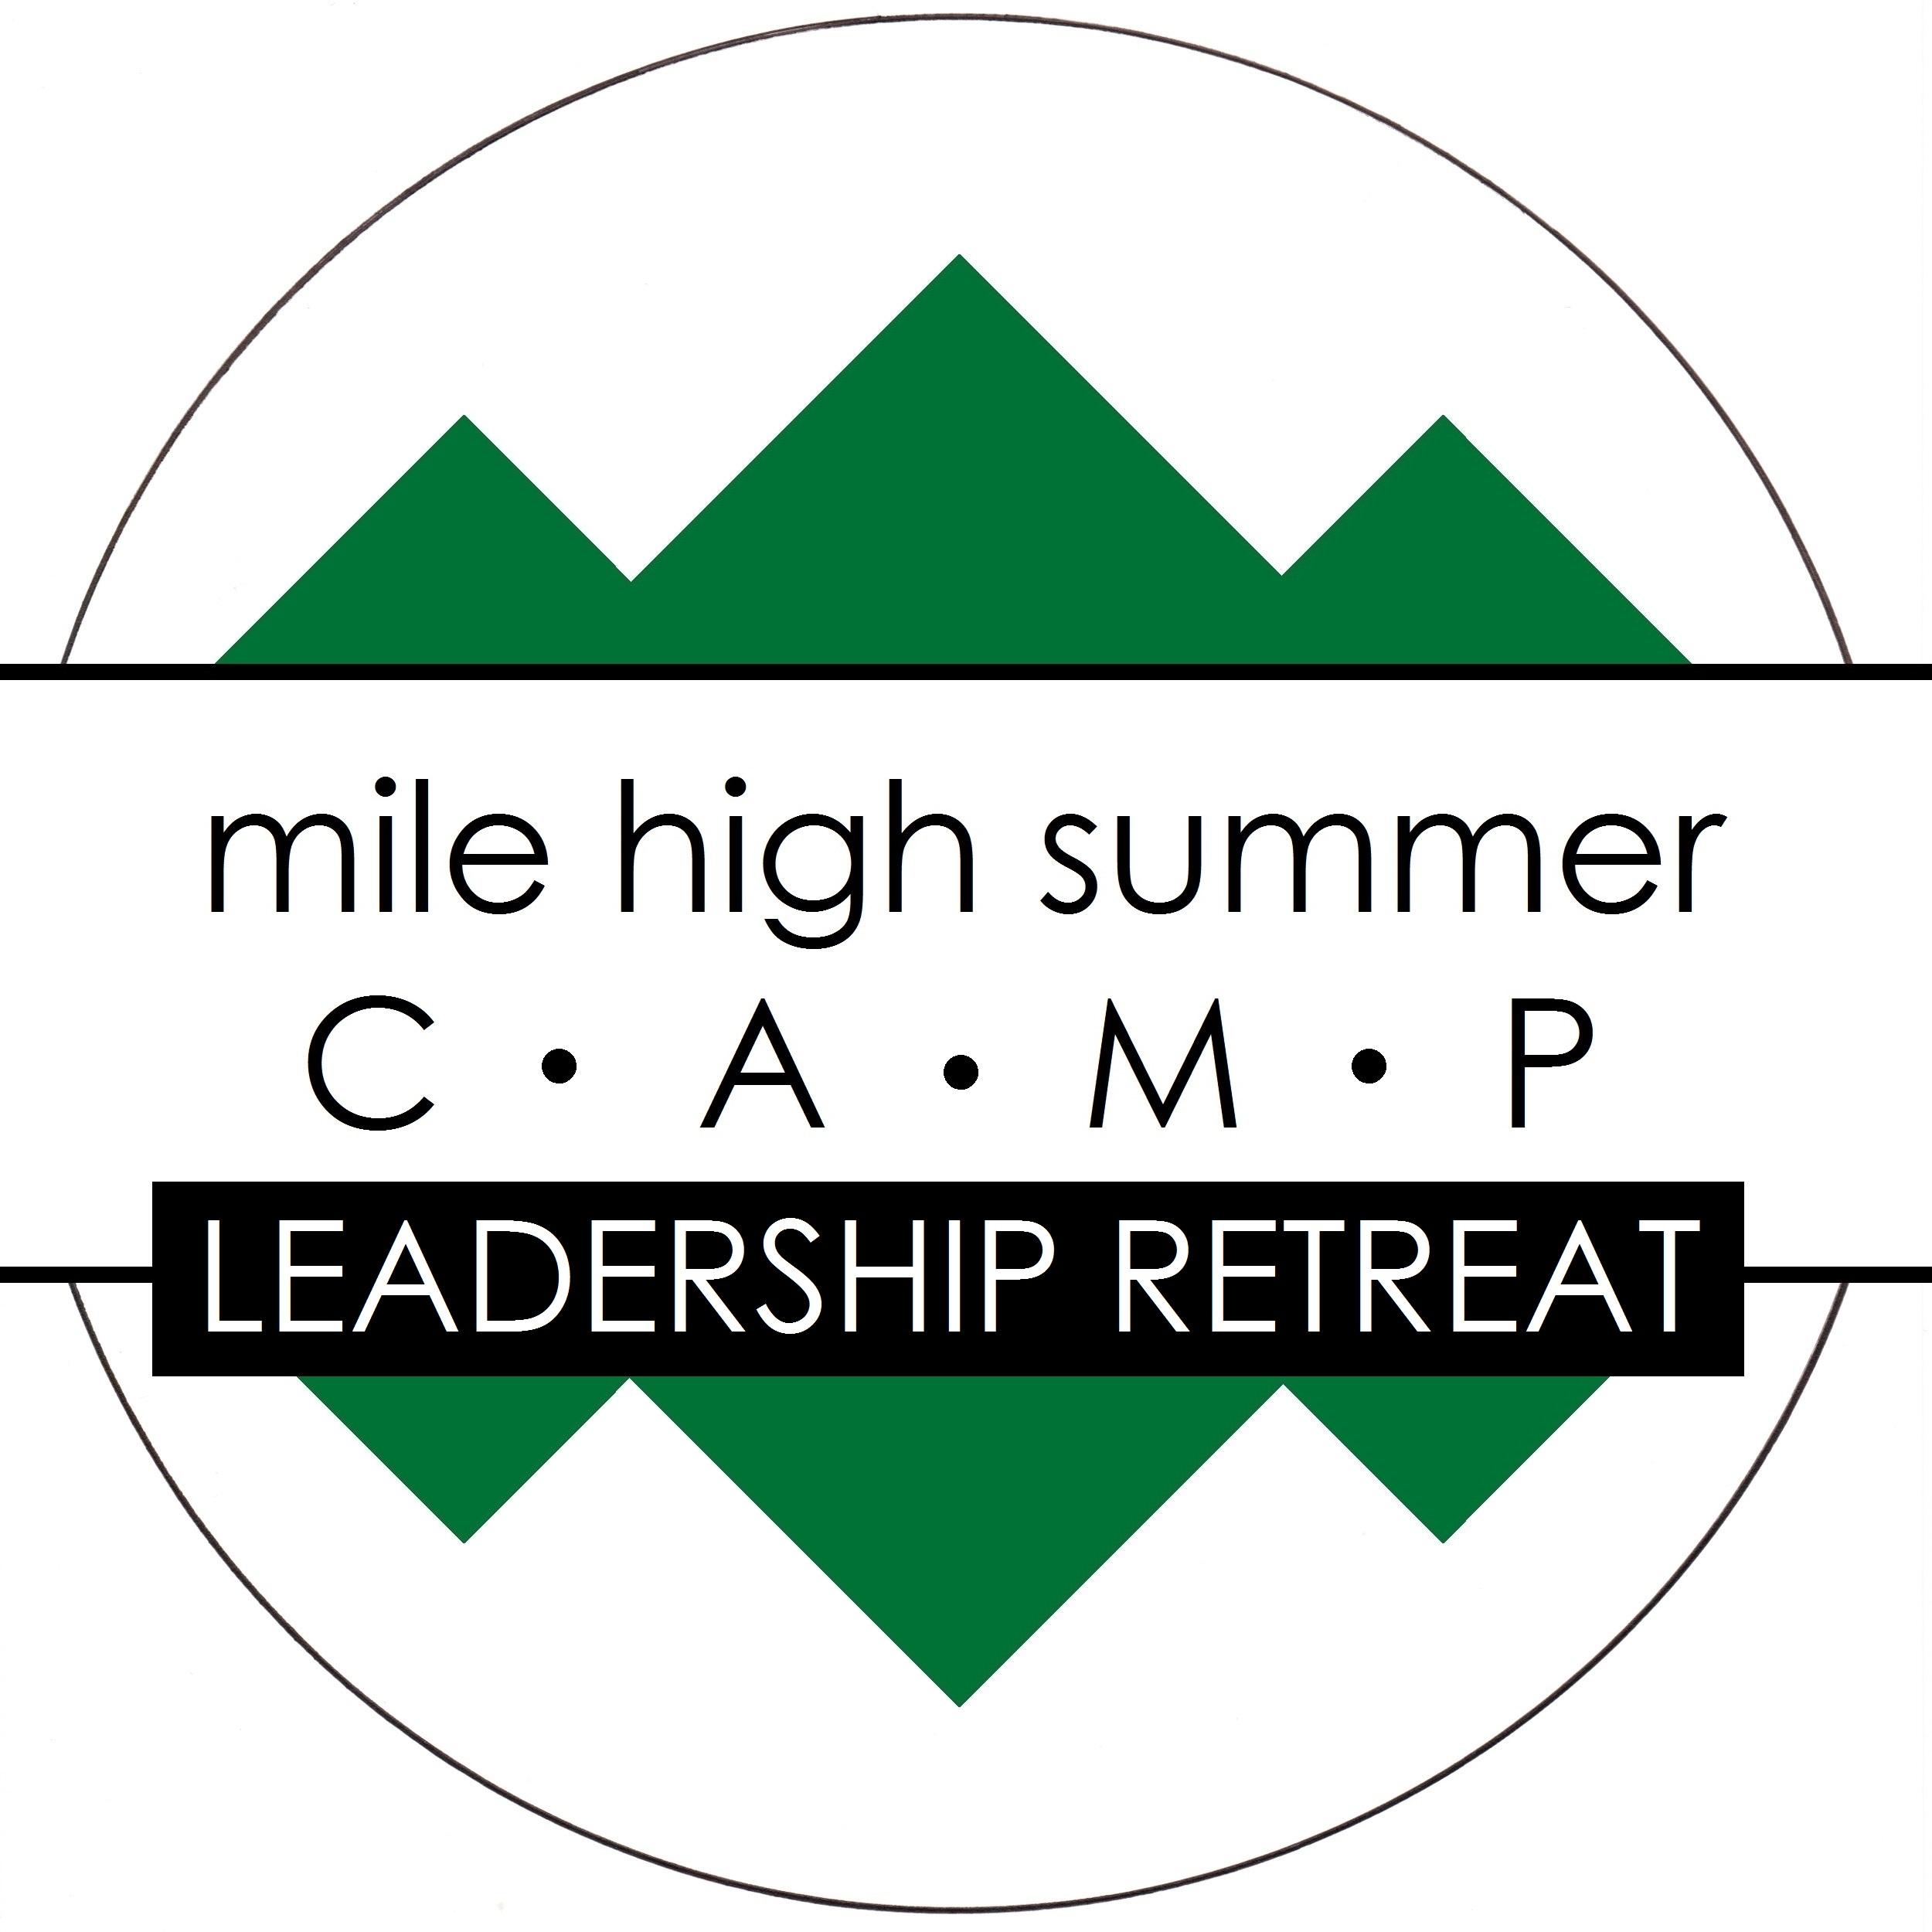 Leadership Retreat: Mile High Summer Camp